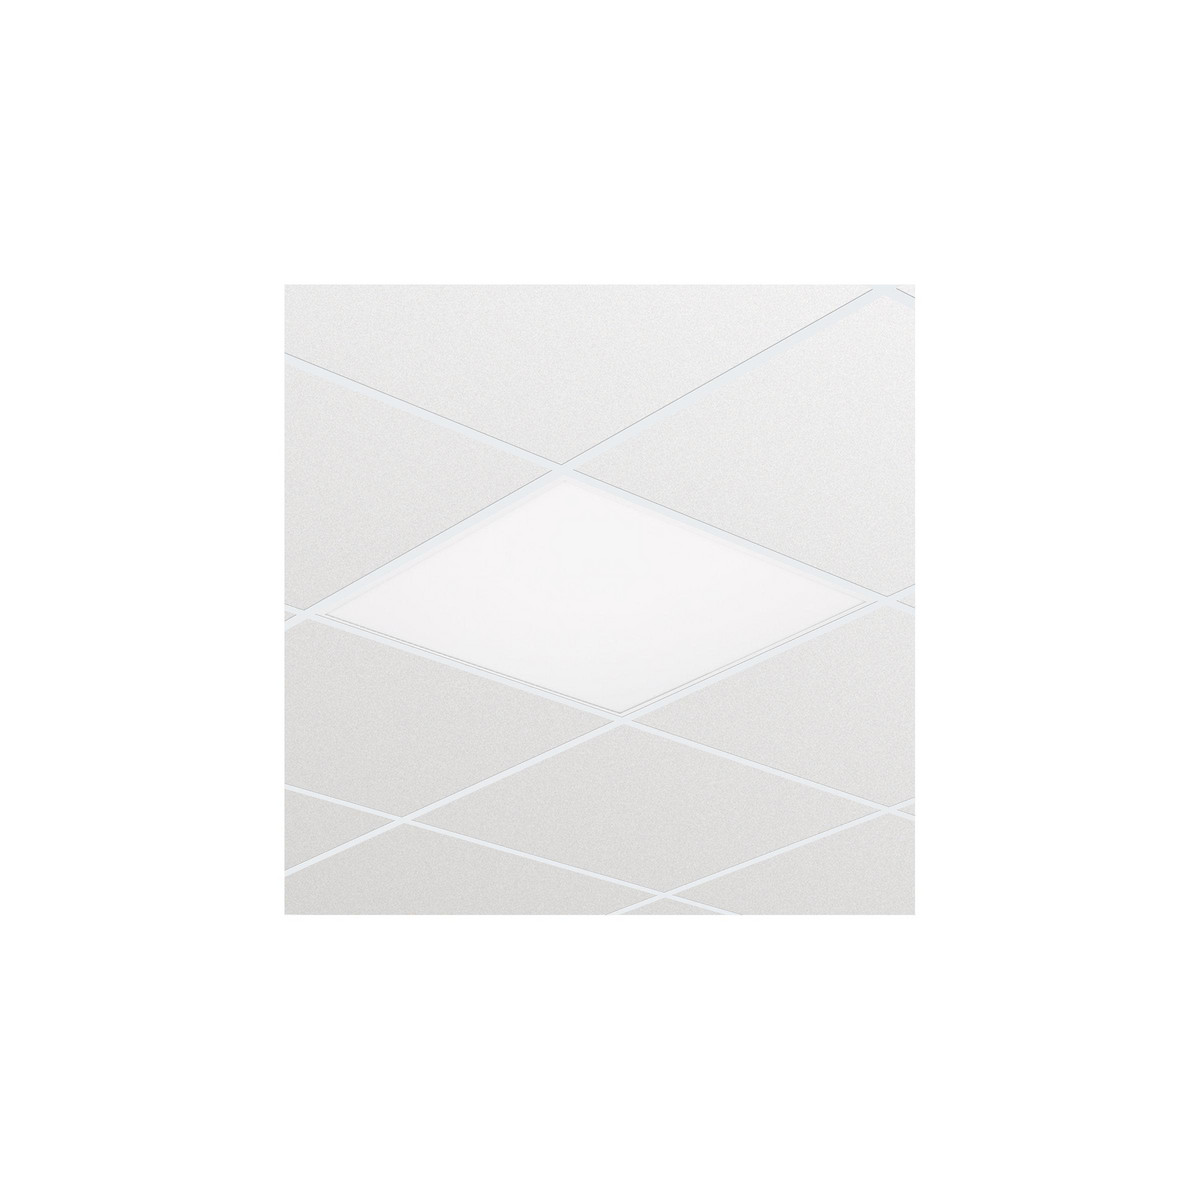 Philips Ledinaire Panel RC065B Gen2 60x60 UGR<19 3400lm/840 38W